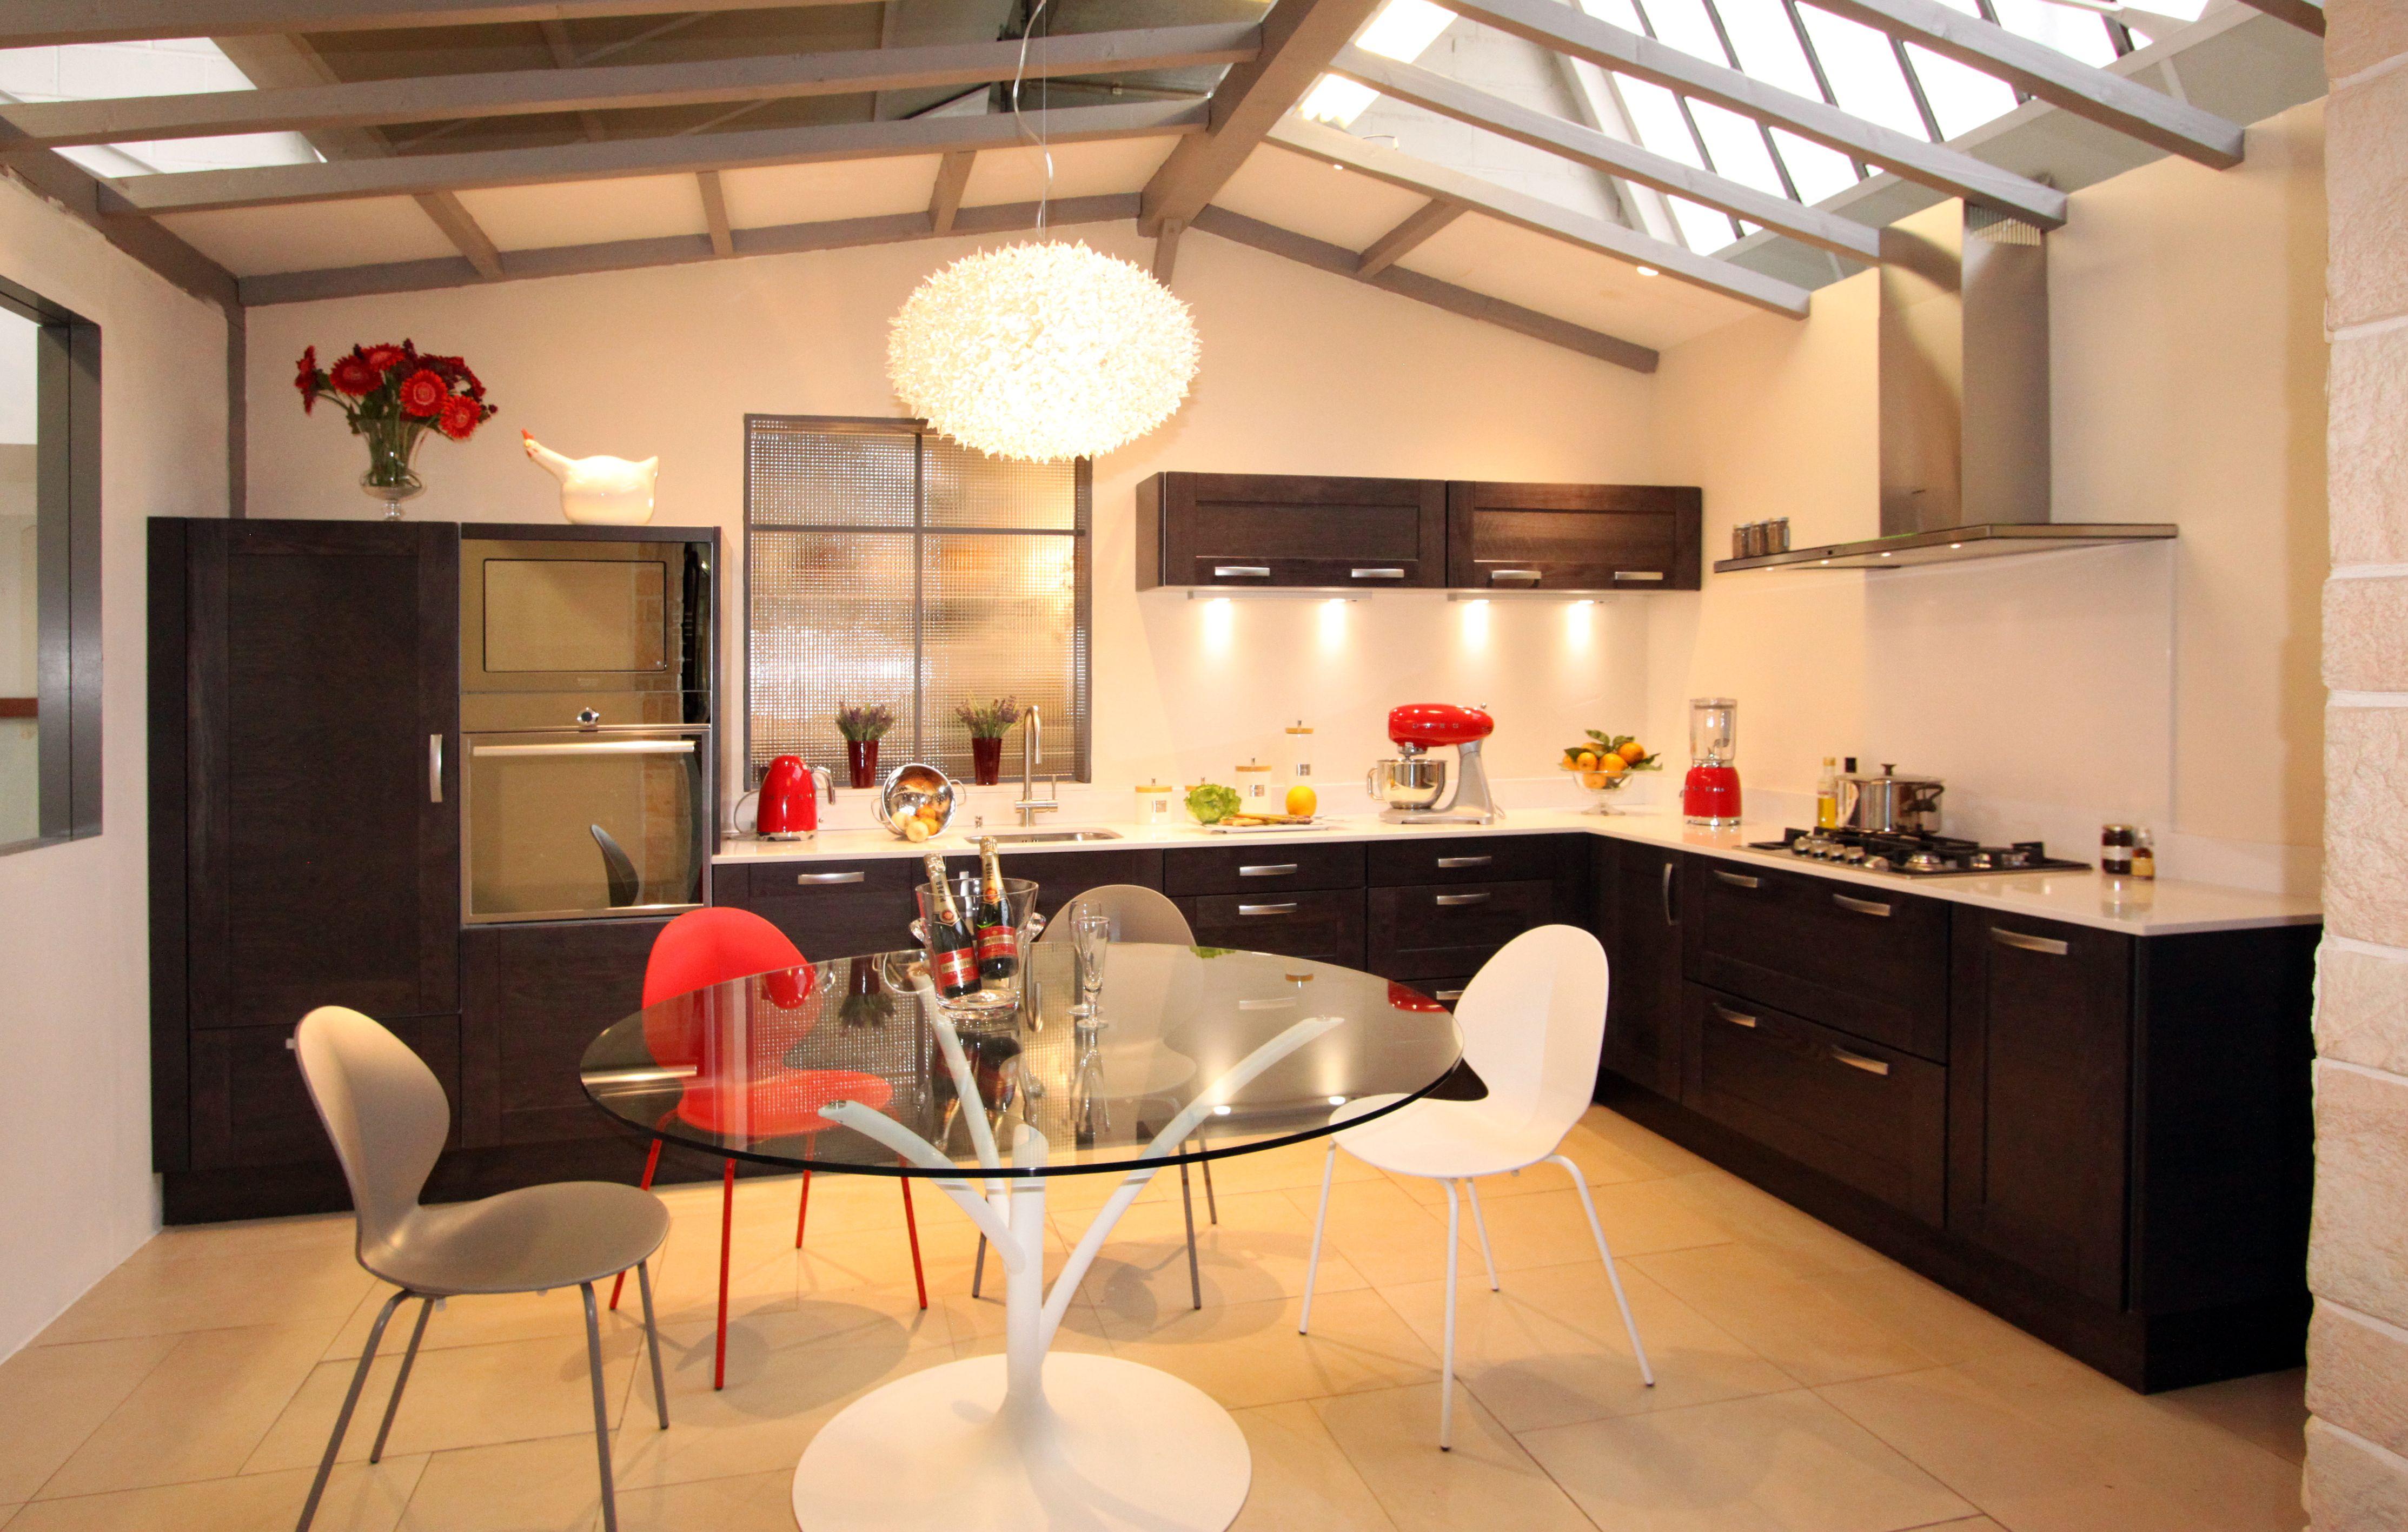 cuisine fabrimeuble bois ch ne fonc fabrication fran aise chaise calligaris basil table. Black Bedroom Furniture Sets. Home Design Ideas